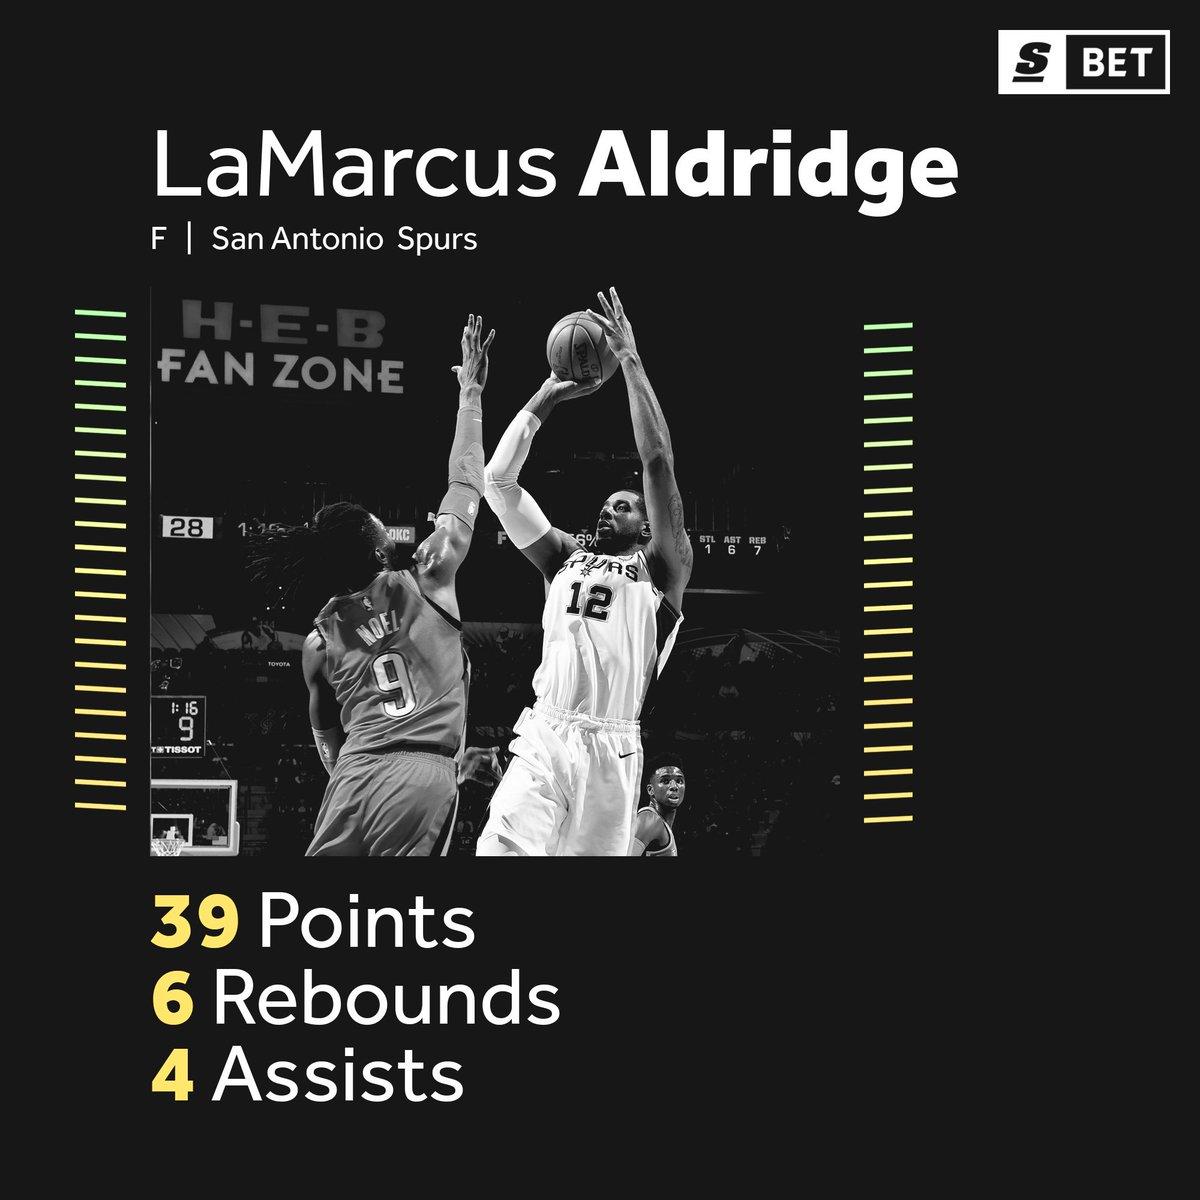 @theScore's photo on LaMarcus Aldridge